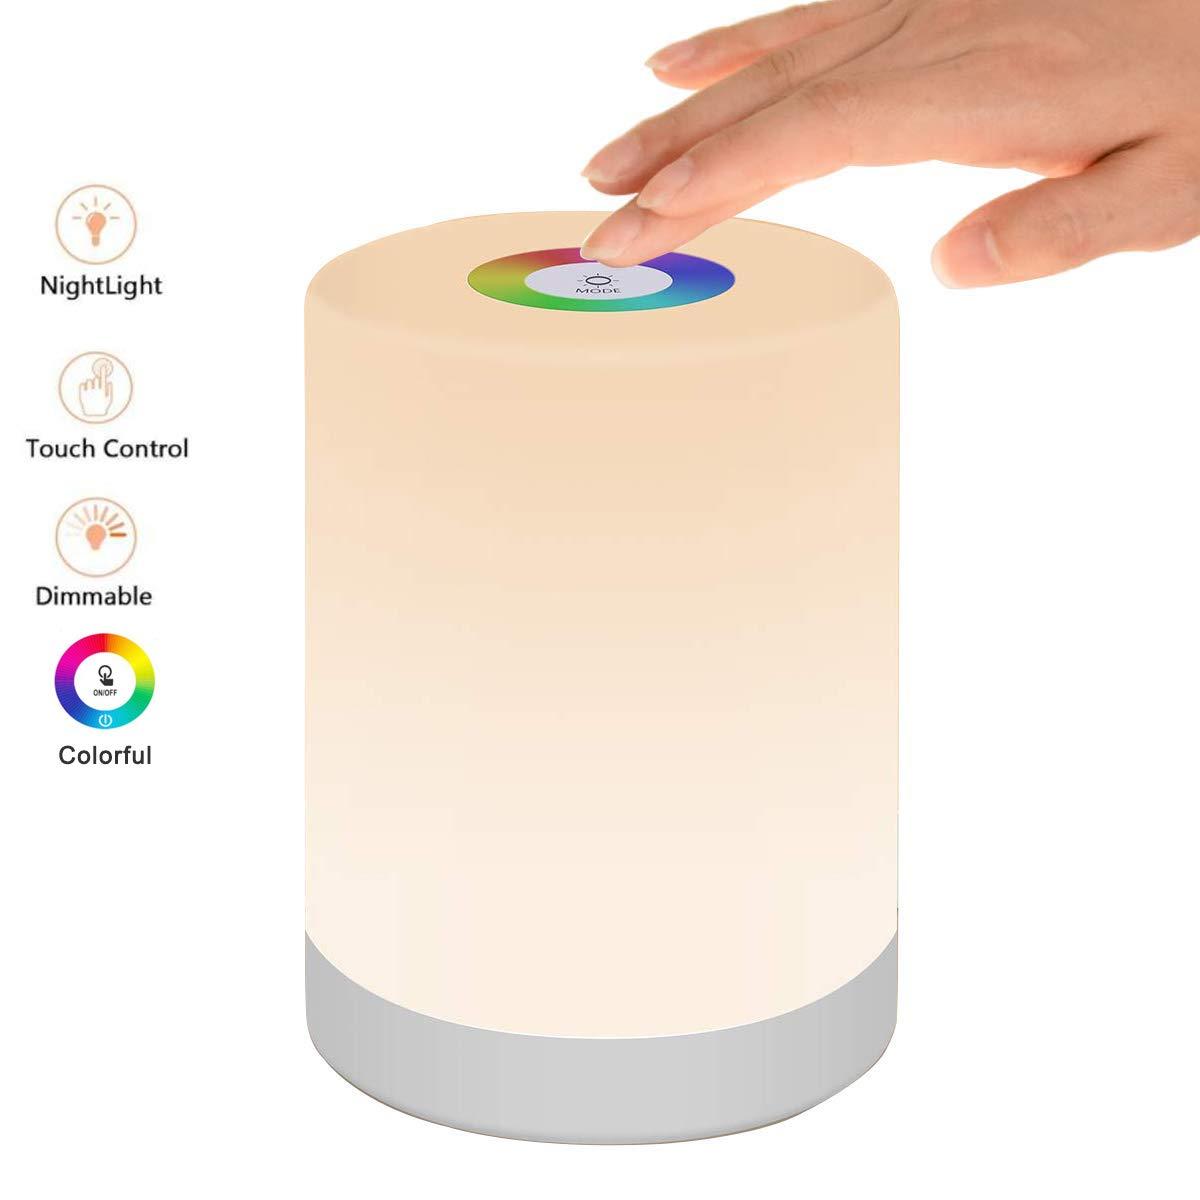 Lámparas de Mesa Inteligente Recargable, LED 6 Colores